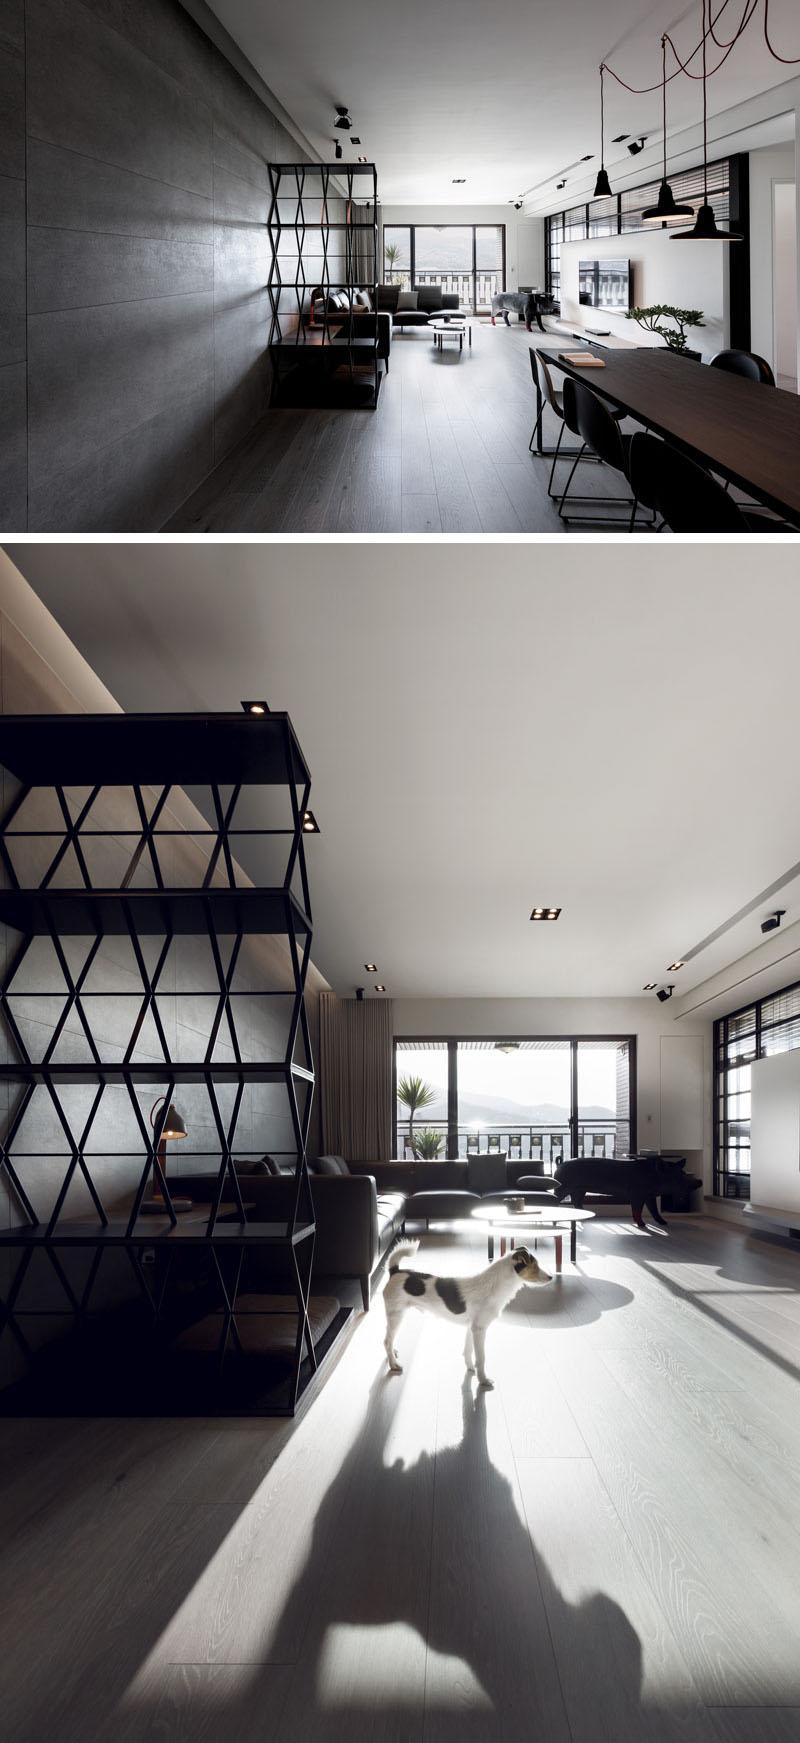 dog-bed-room-divider-table-220117-1045-03